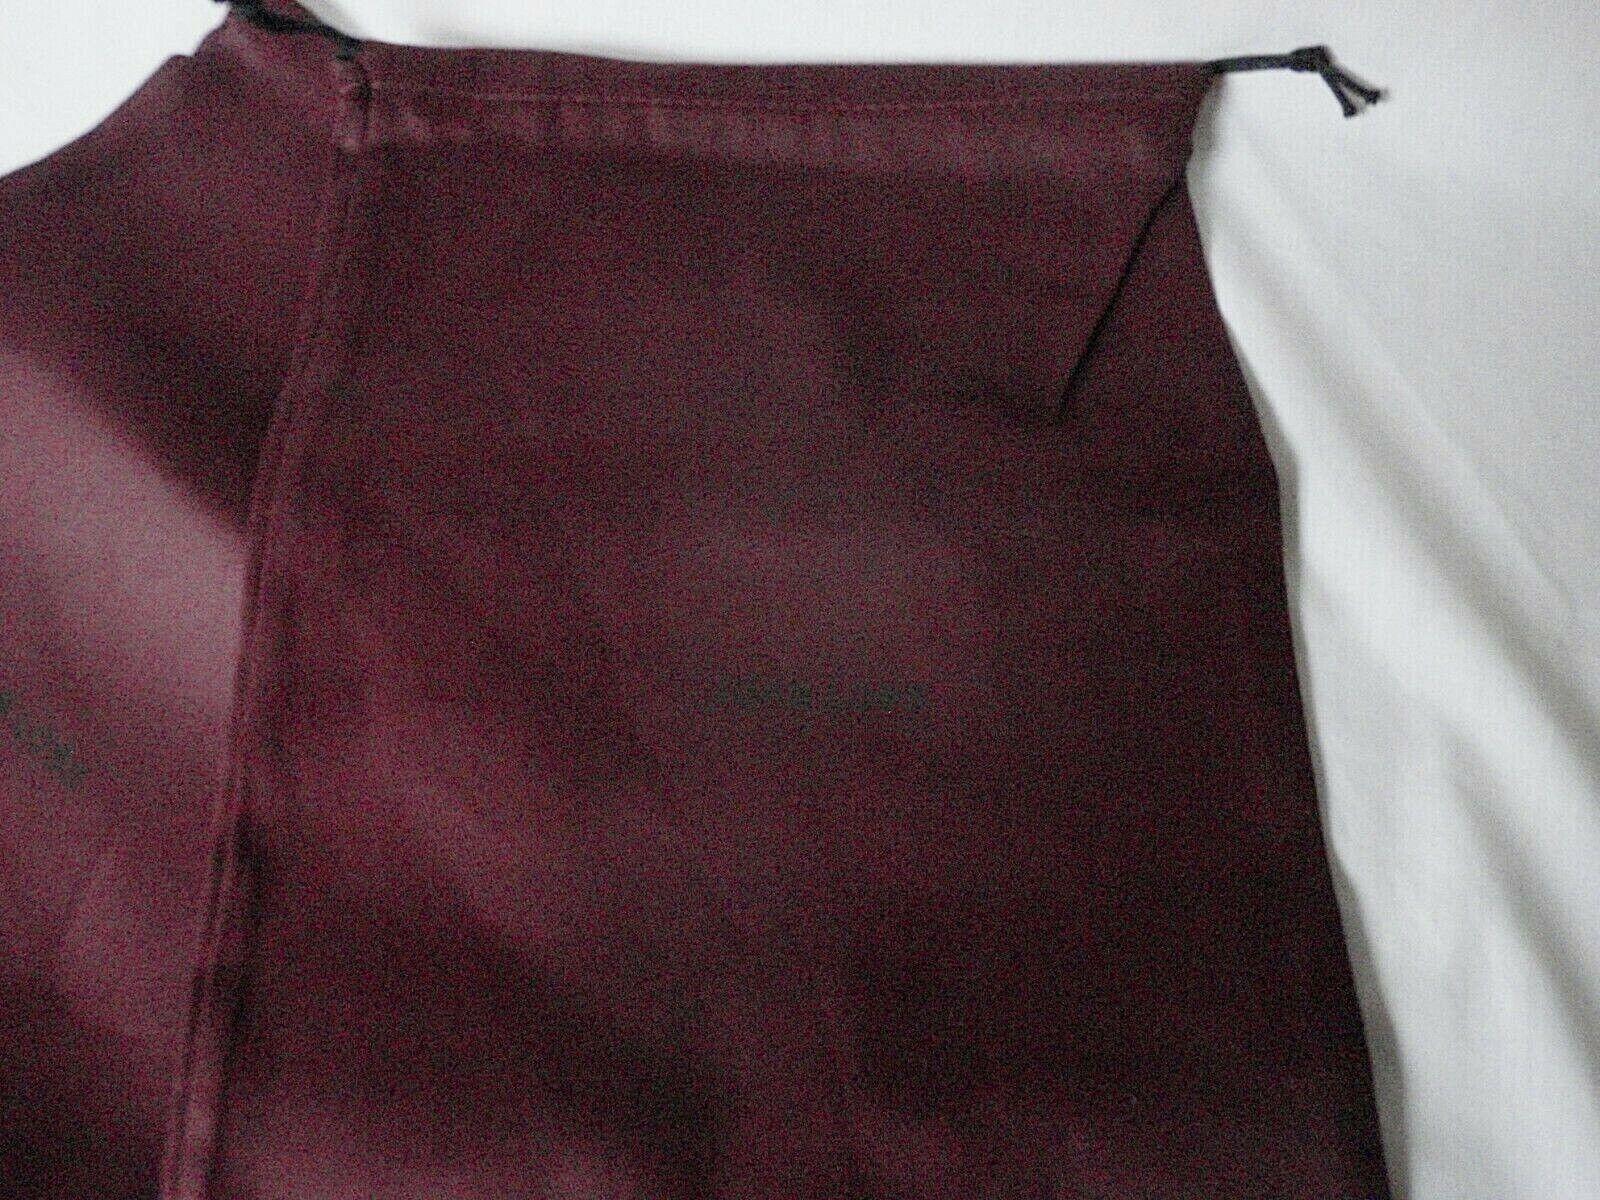 NEW JOHN LOBB Bootmaker Russet (Red) Cotton Boot Dustbags Sleeper Bags 1 pair